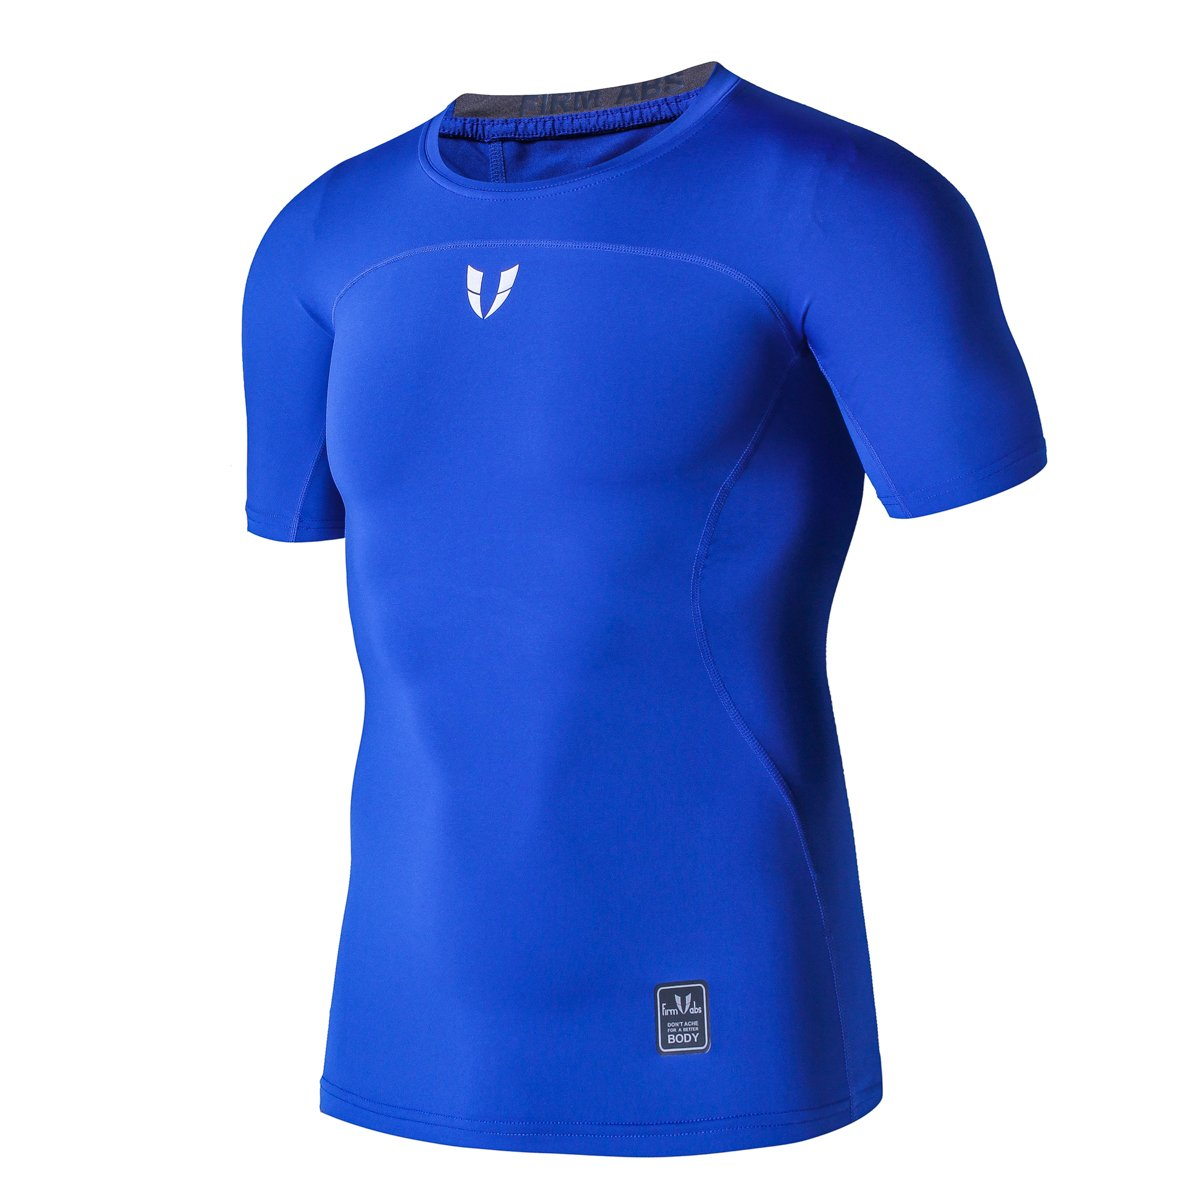 FIRM ABS Short Sleeve Sports Compression Shirt Mens Shirts (L,Blue)